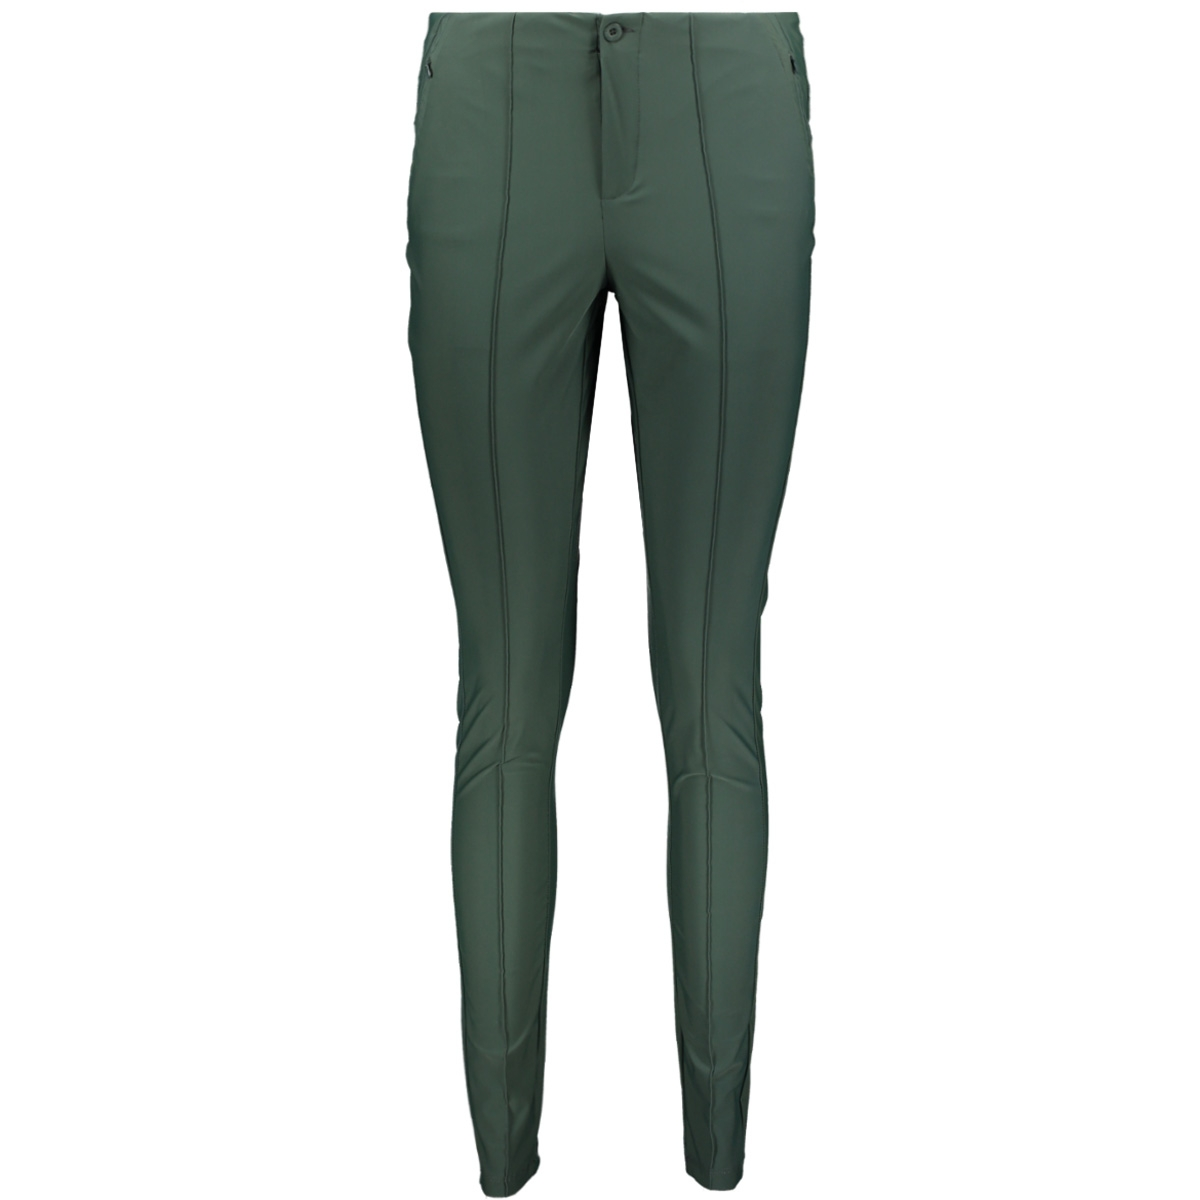 195 joya winter travel trouser zoso broek forest